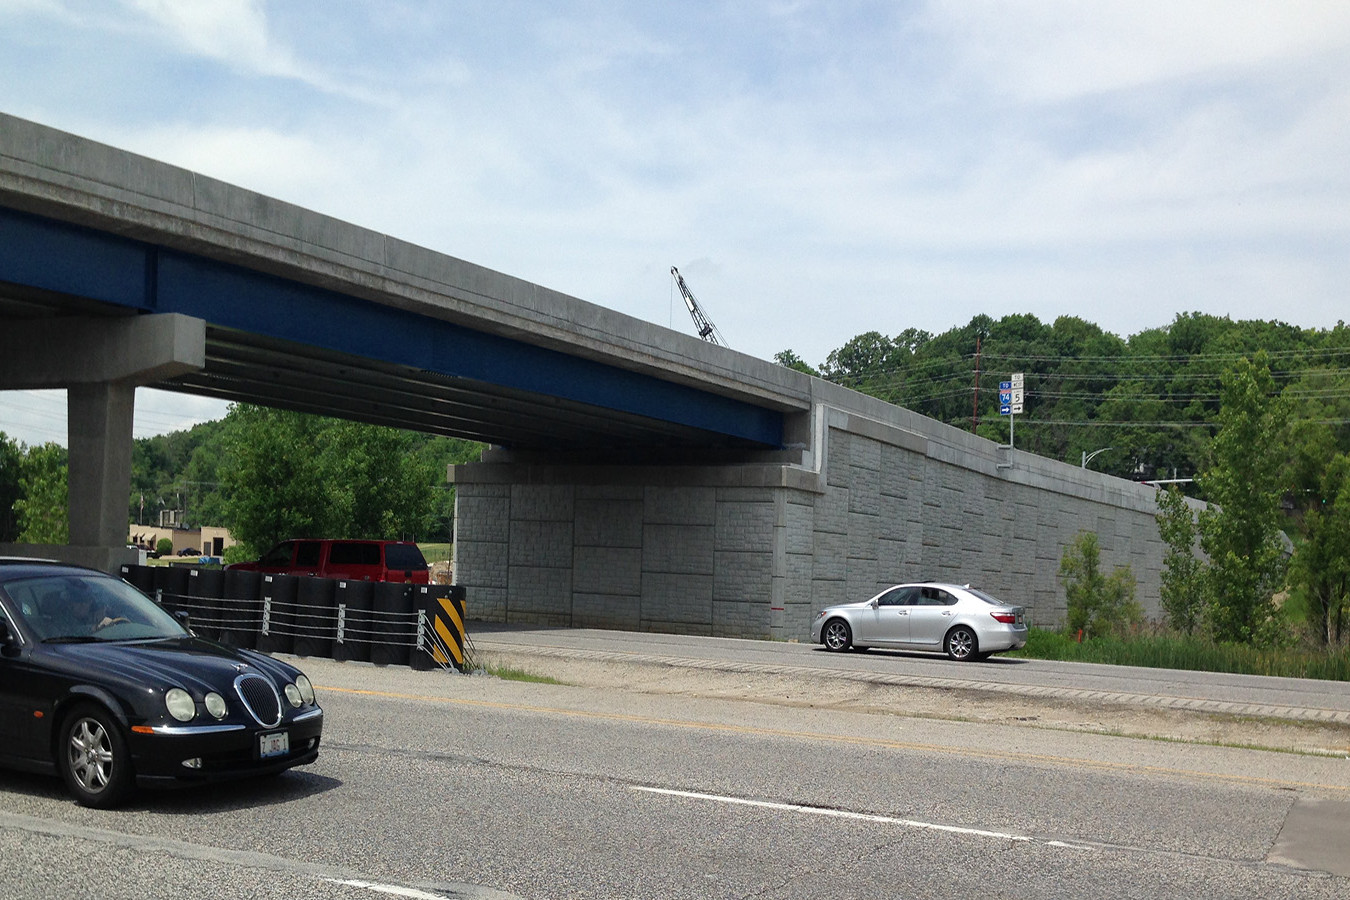 John Deere Road (IL 5) Widening & Reconstruction | Ciorba Group